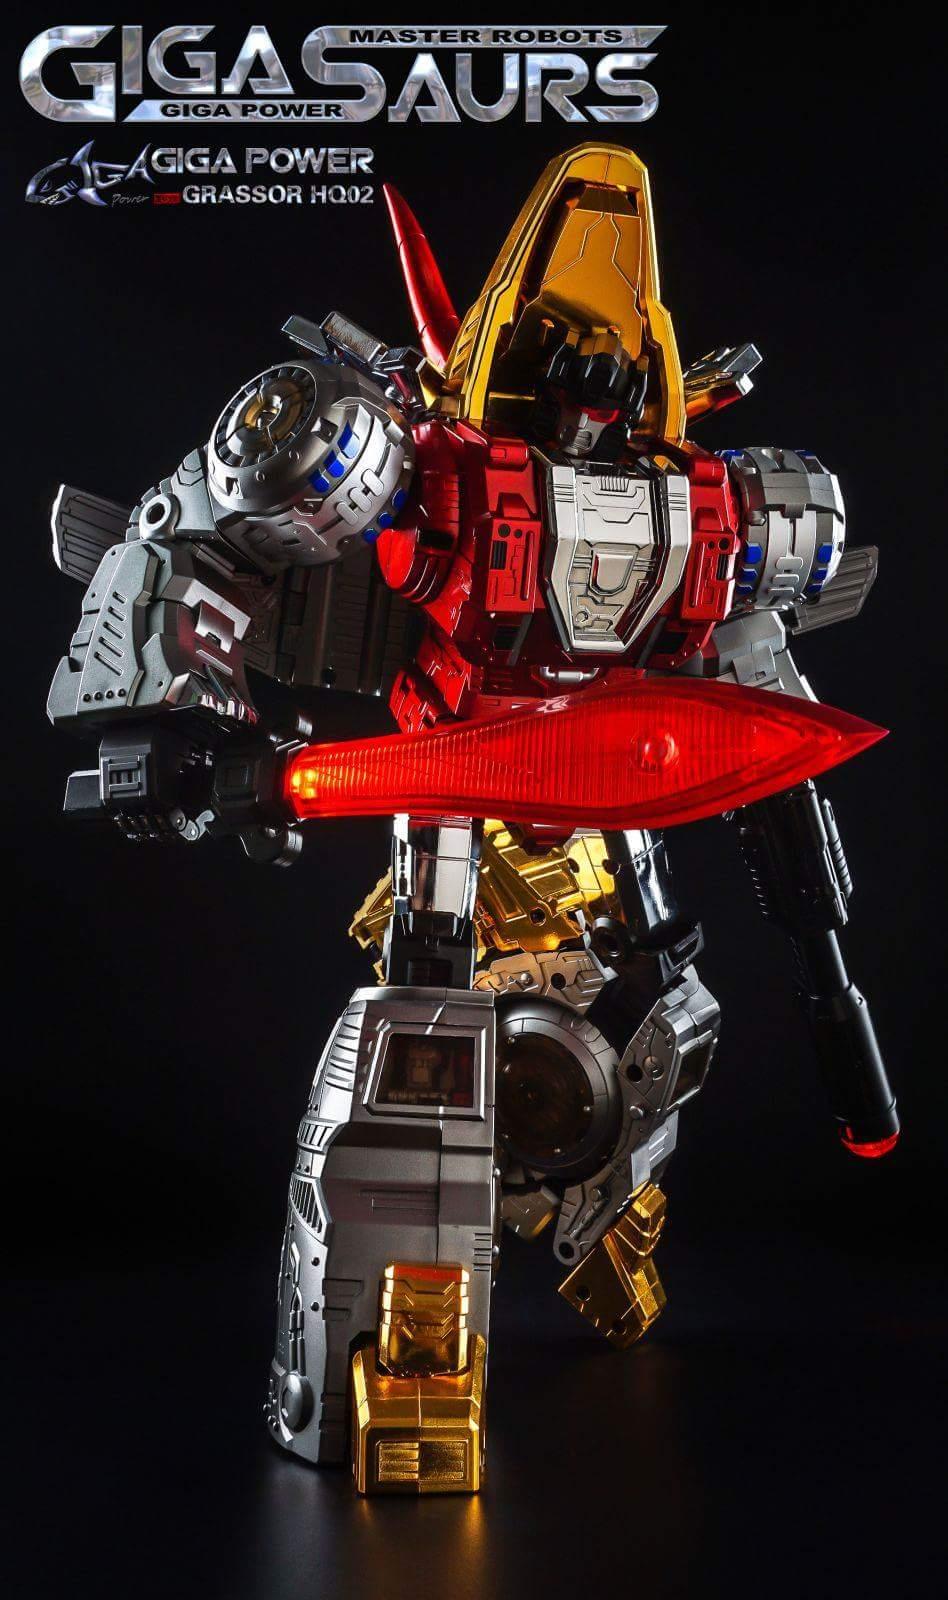 [GigaPower] Produit Tiers - Jouets HQ-01 Superator + HQ-02 Grassor + HQ-03 Guttur + HQ-04 Graviter + HQ-05 Gaudenter - aka Dinobots - Page 4 XeR0SVpL